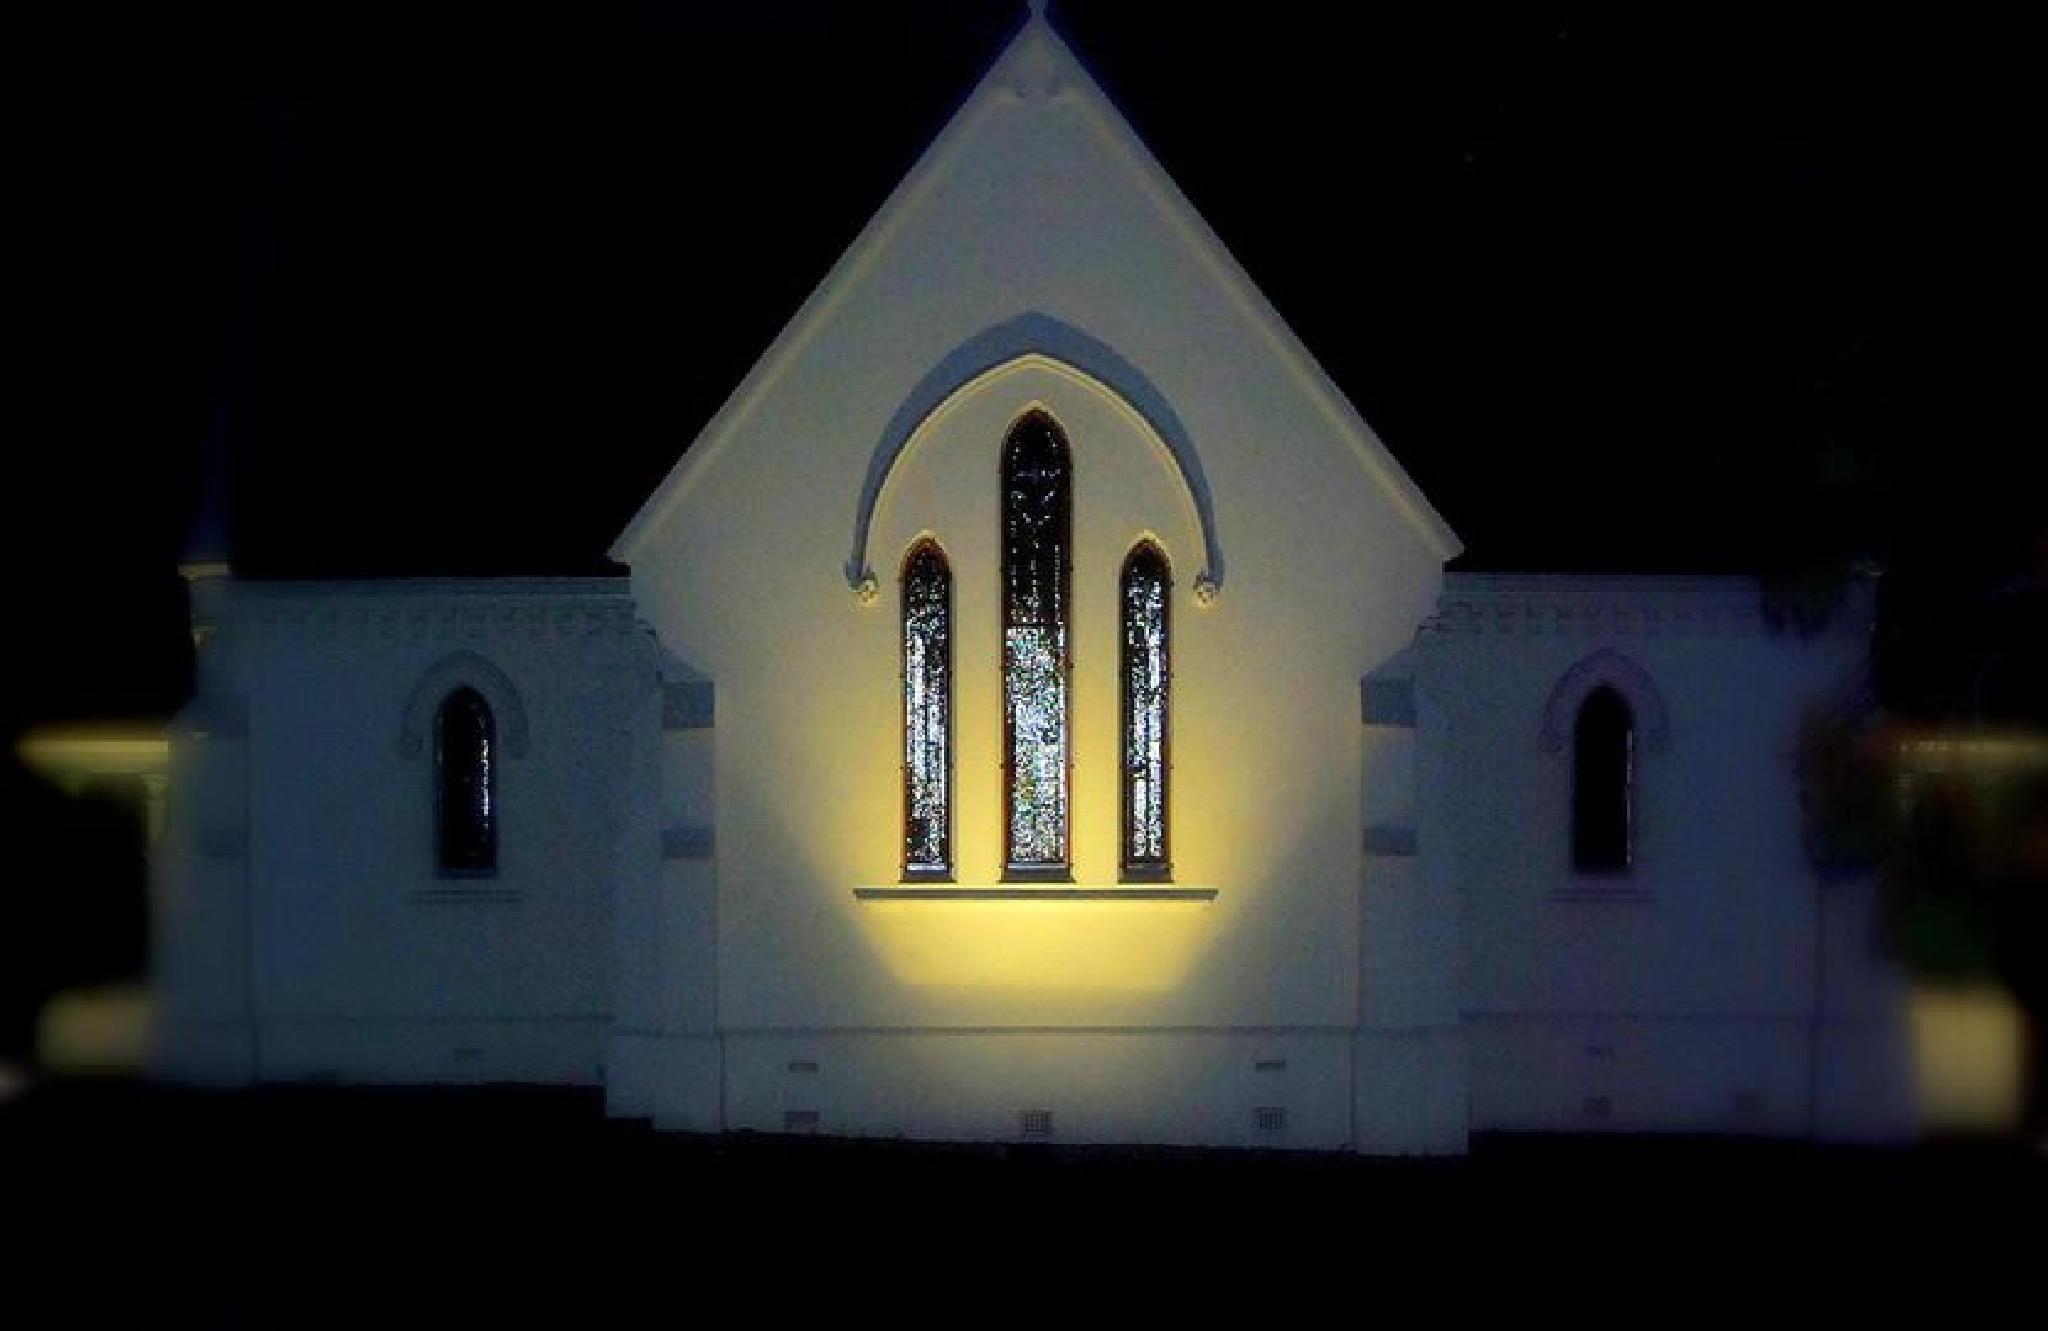 Church at night by Nerina Stephens